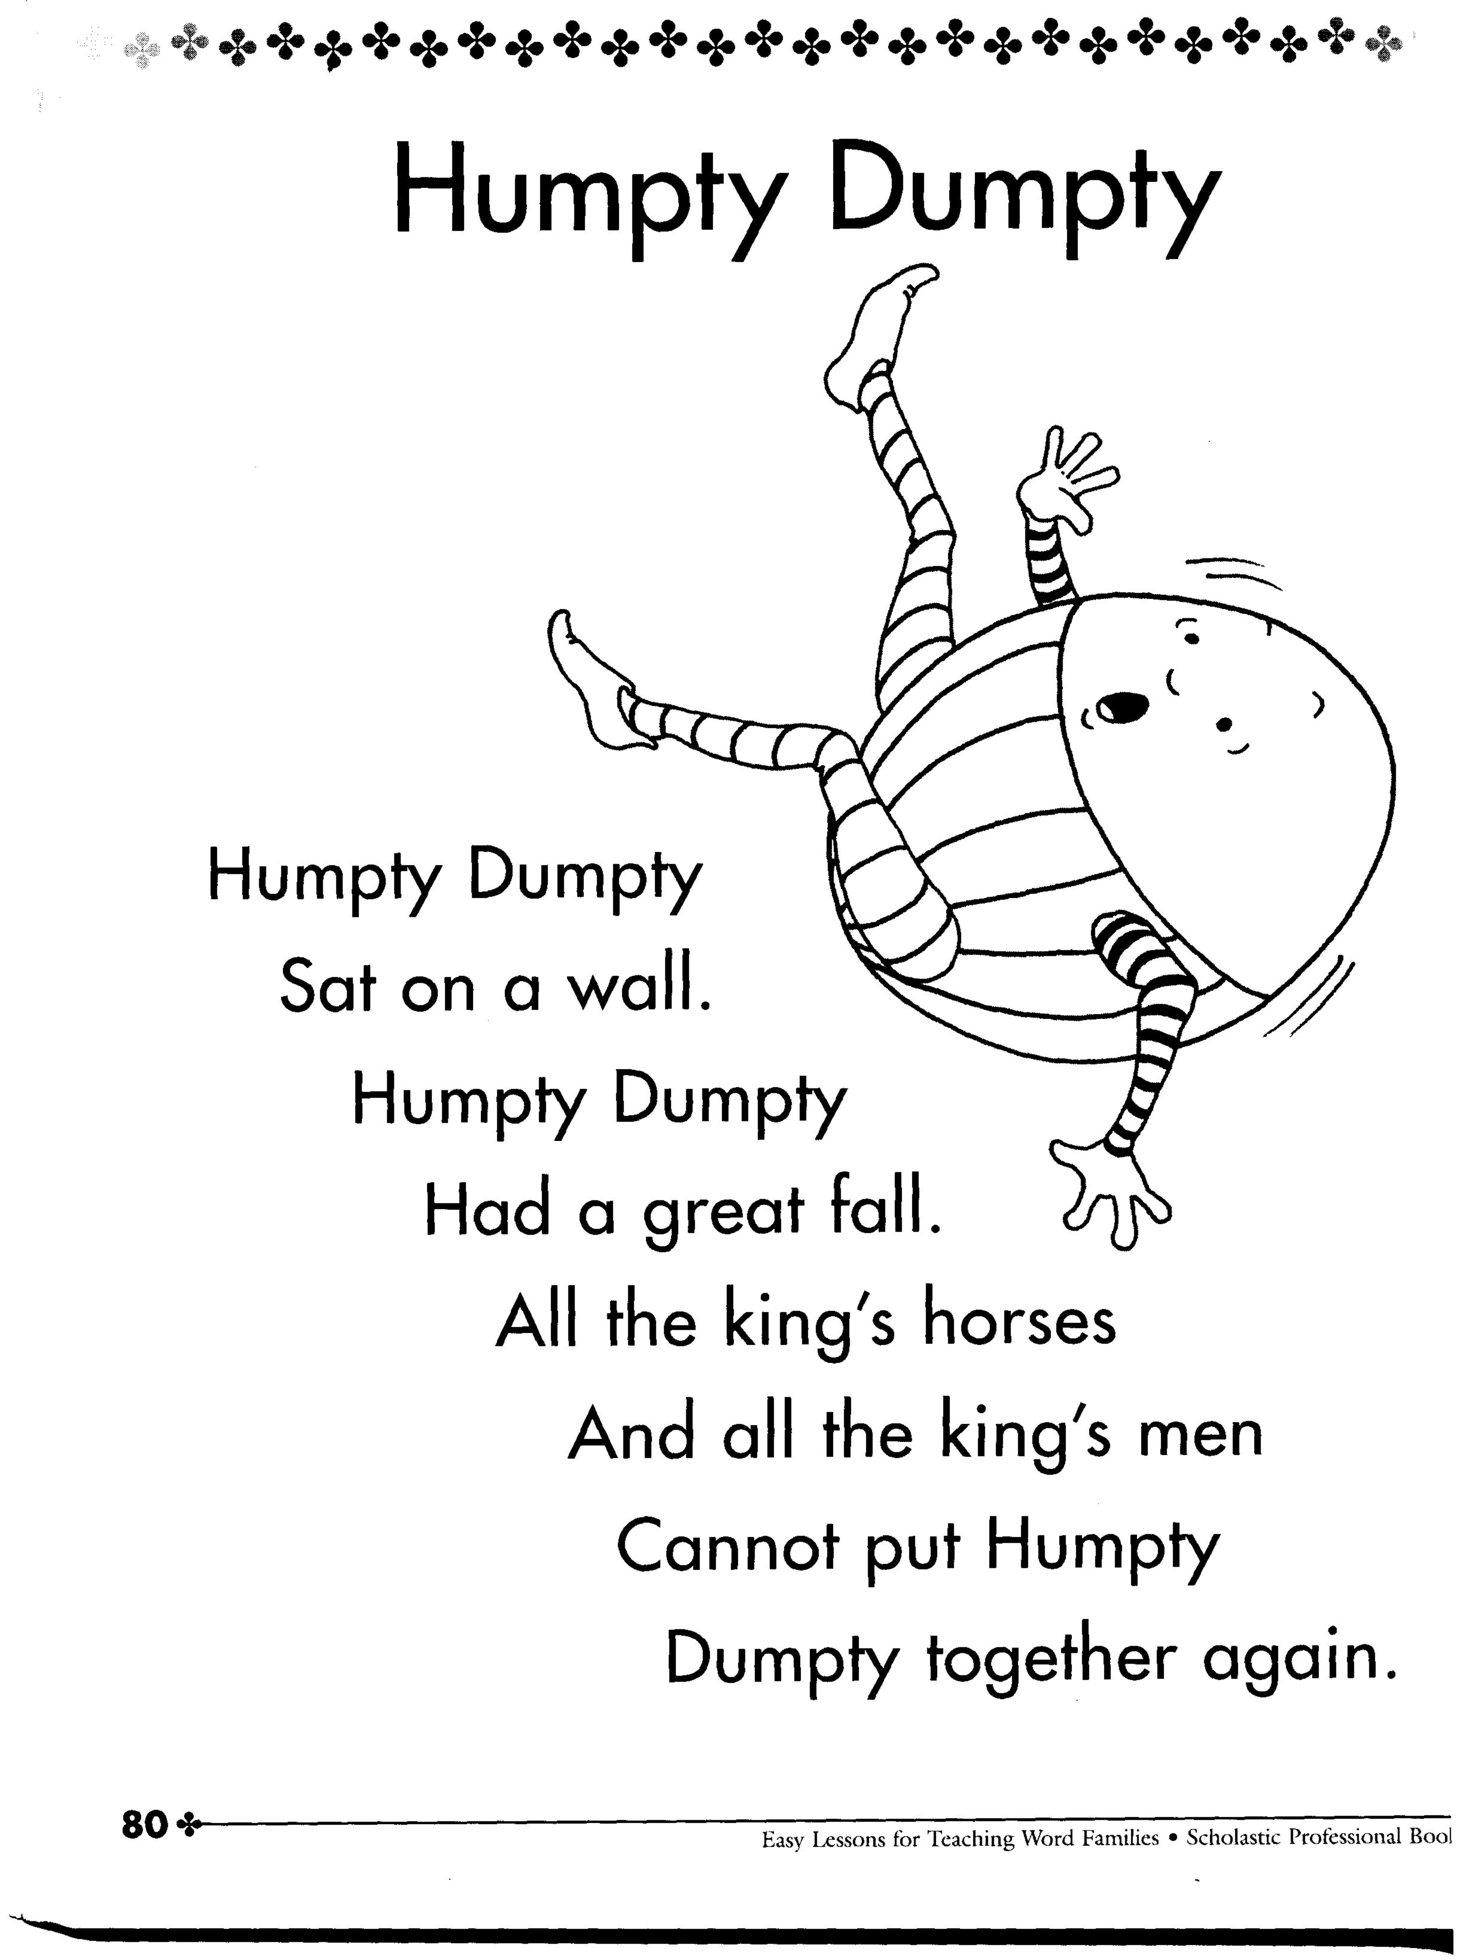 Free Humpty Dumpty Download Free Clip Art Free Clip Art